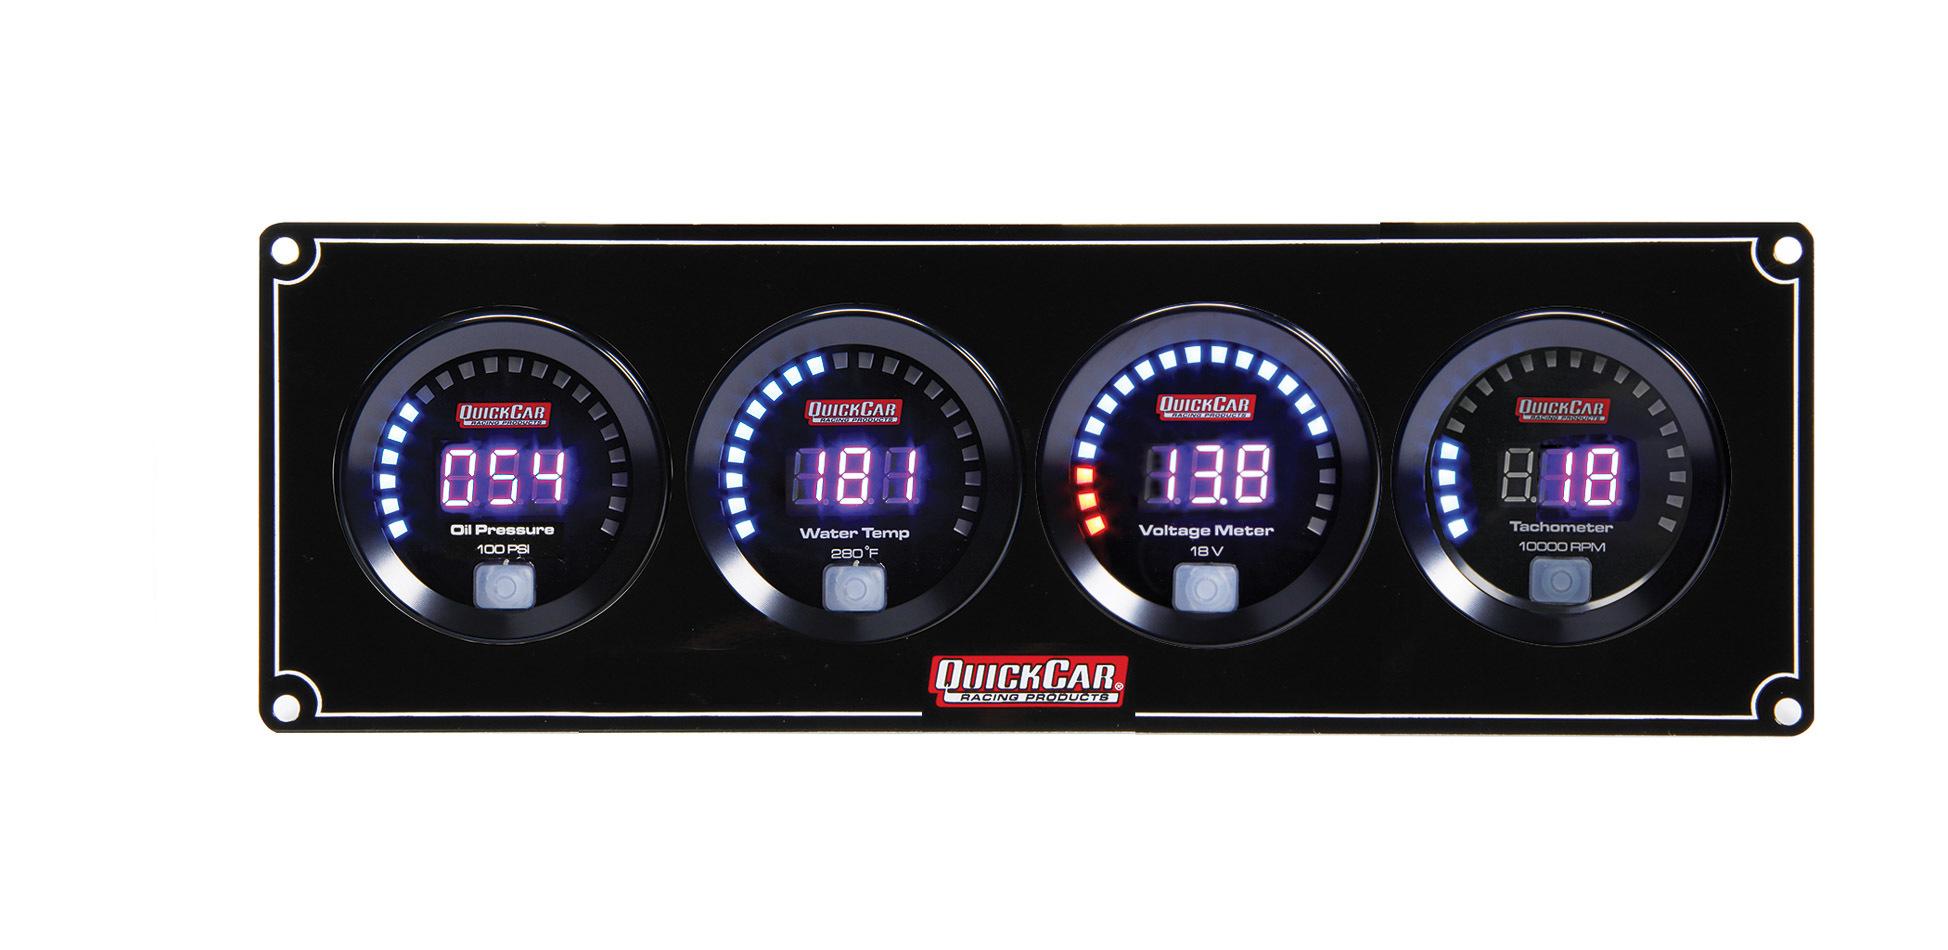 QuickCar 67-3047 Gauge Panel Assembly, Digital, Oil Pressure / Water Temperature / Voltmeter / Tachometer, Black Face, Kit